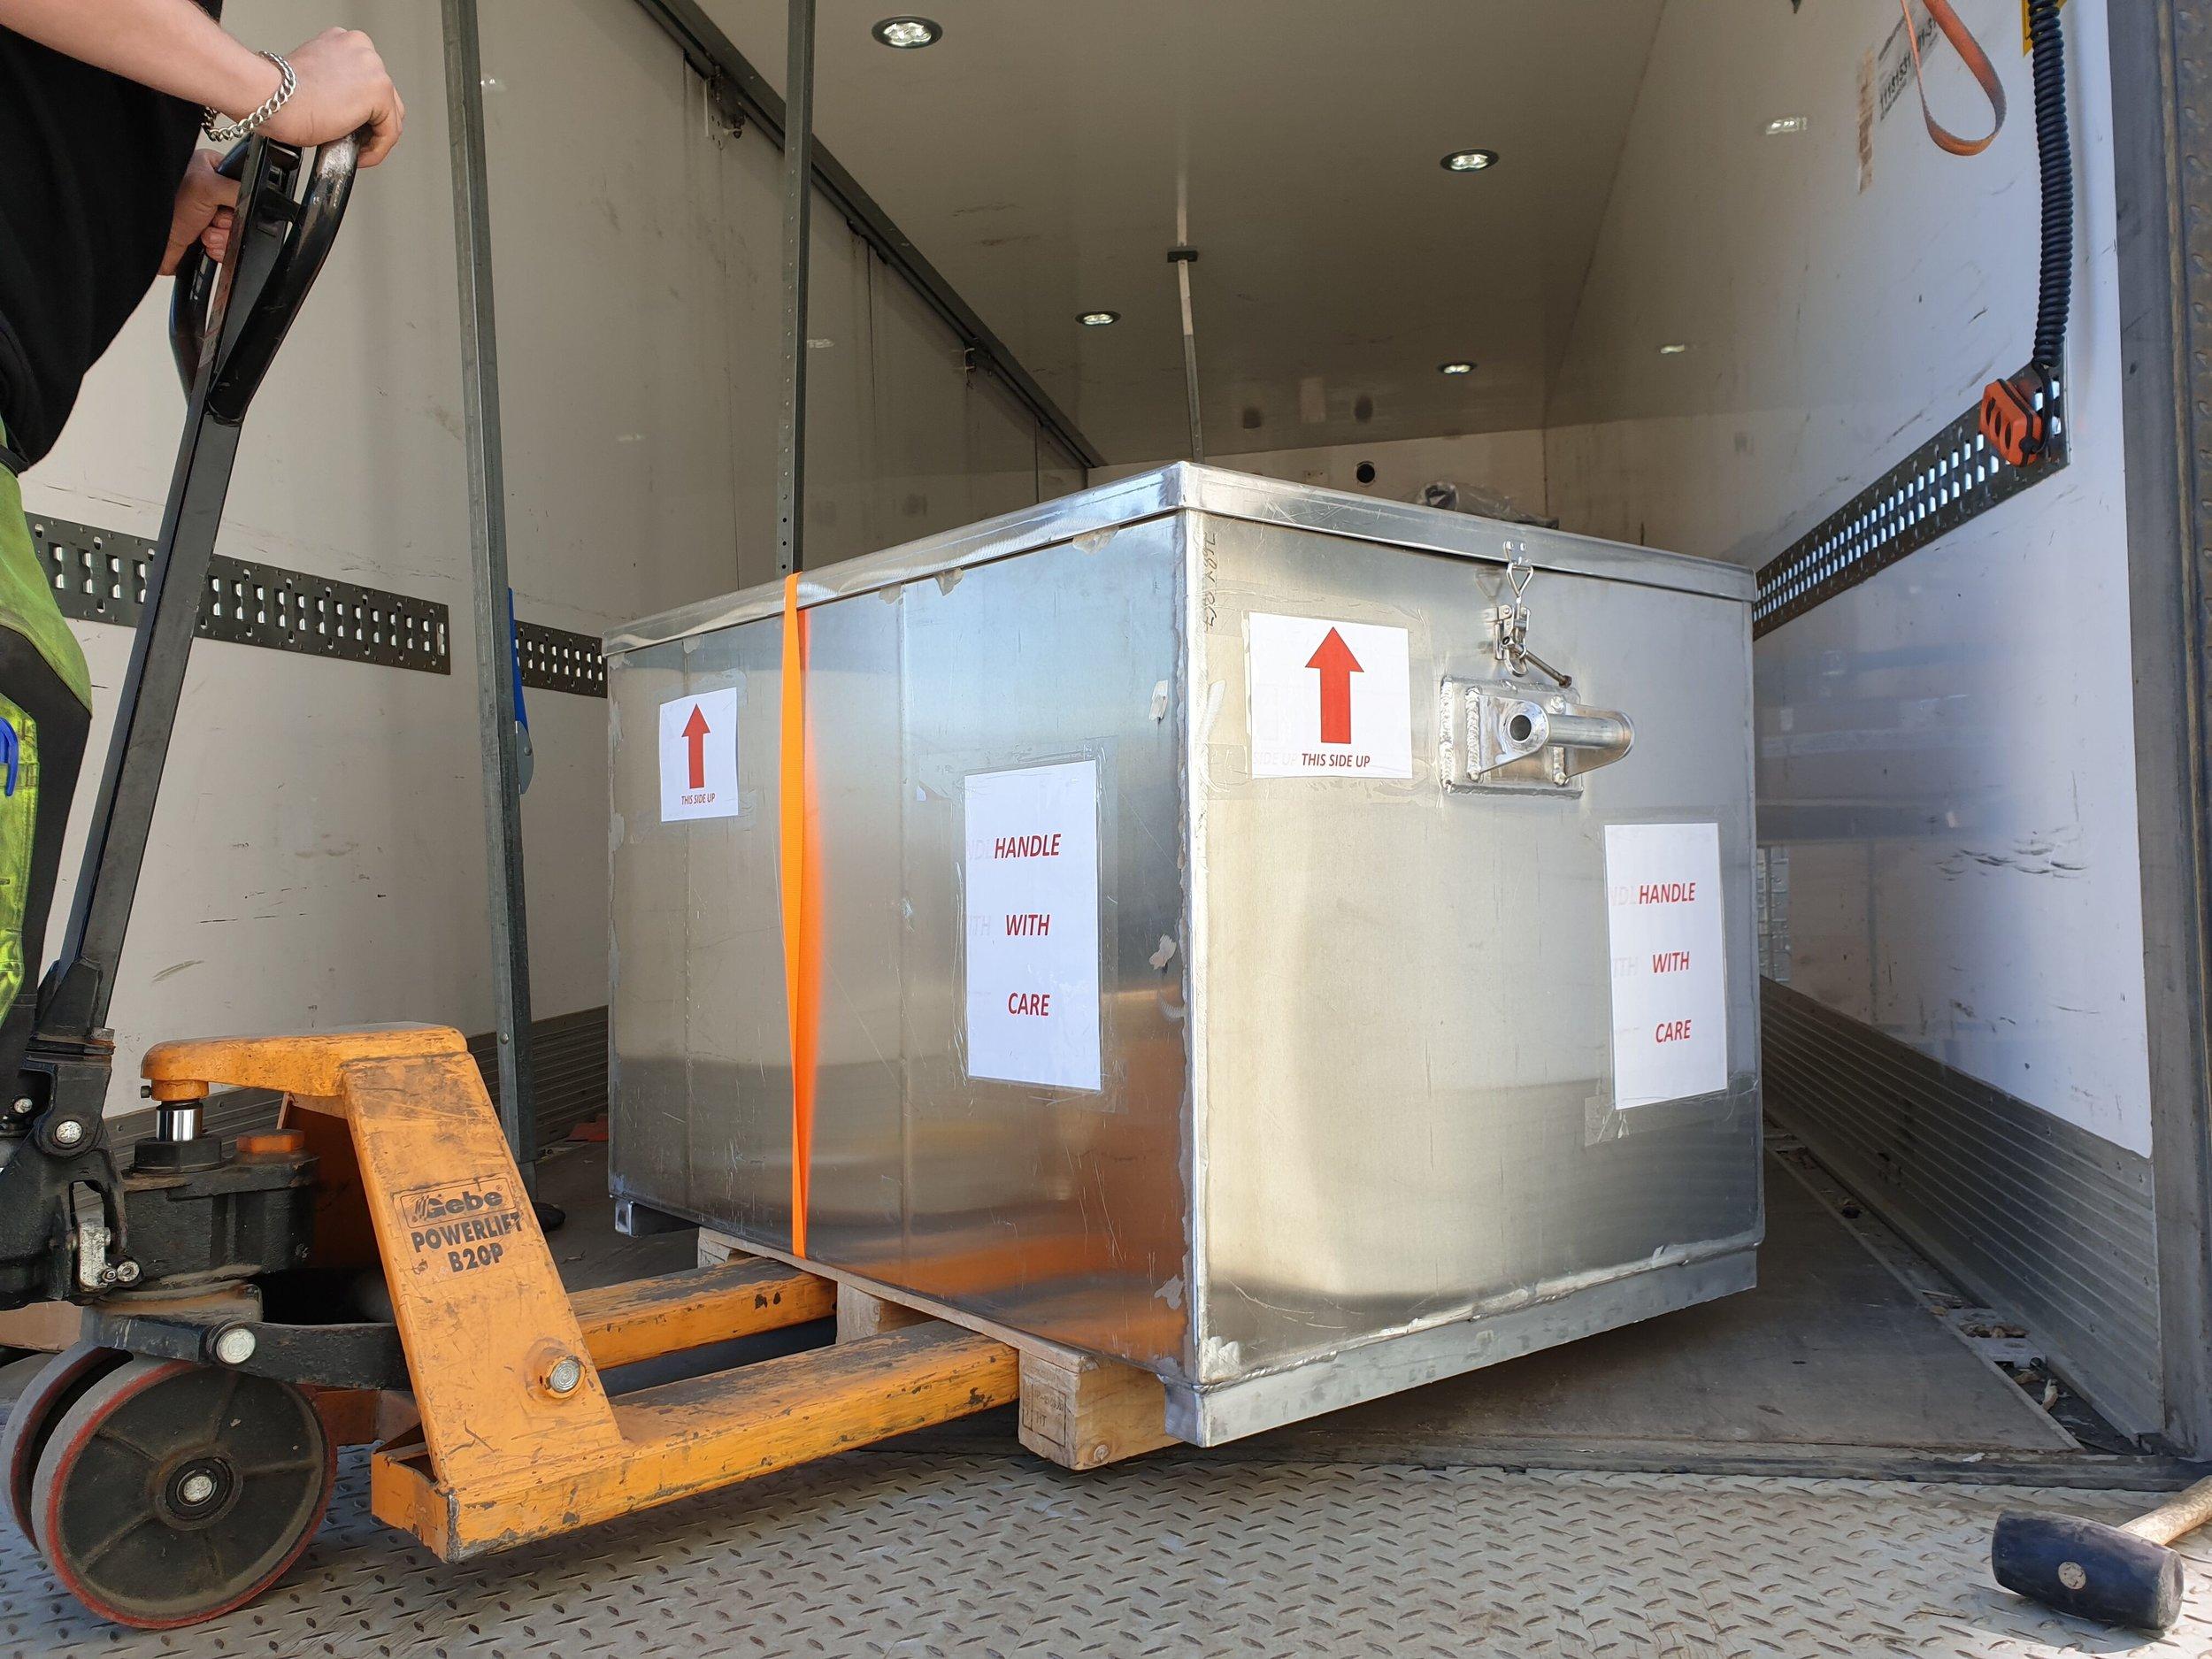 SEM/EDX on its way from Harstad to Kuwait City